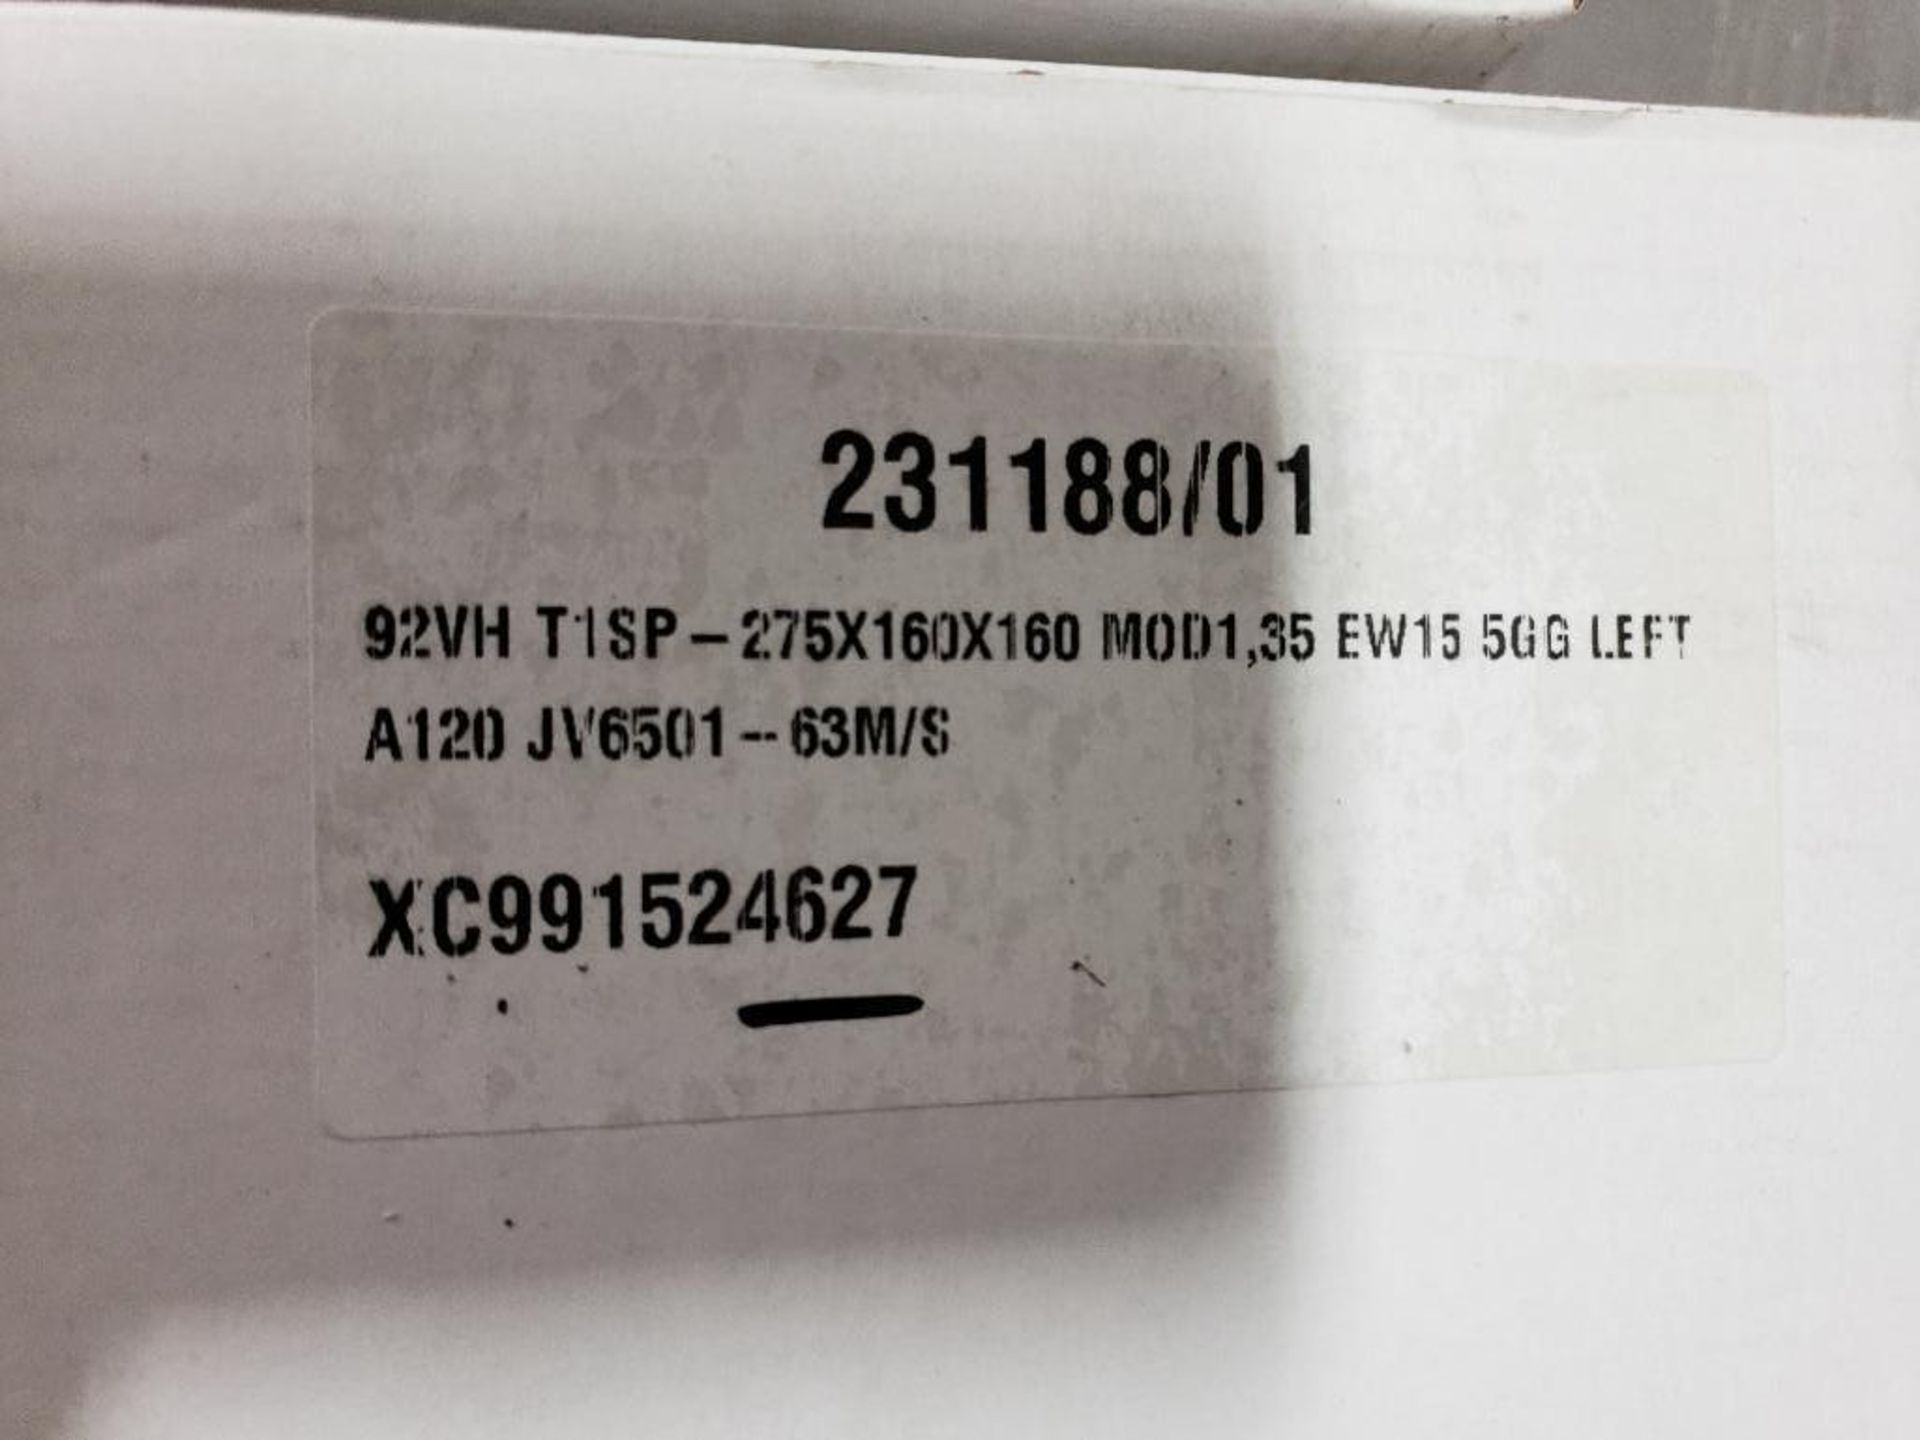 Qty 3 - 3M Abrasives grinding wheels XC991524627. 275x160x160 Mod1,35 EW15-5GG-Left. - Image 2 of 2